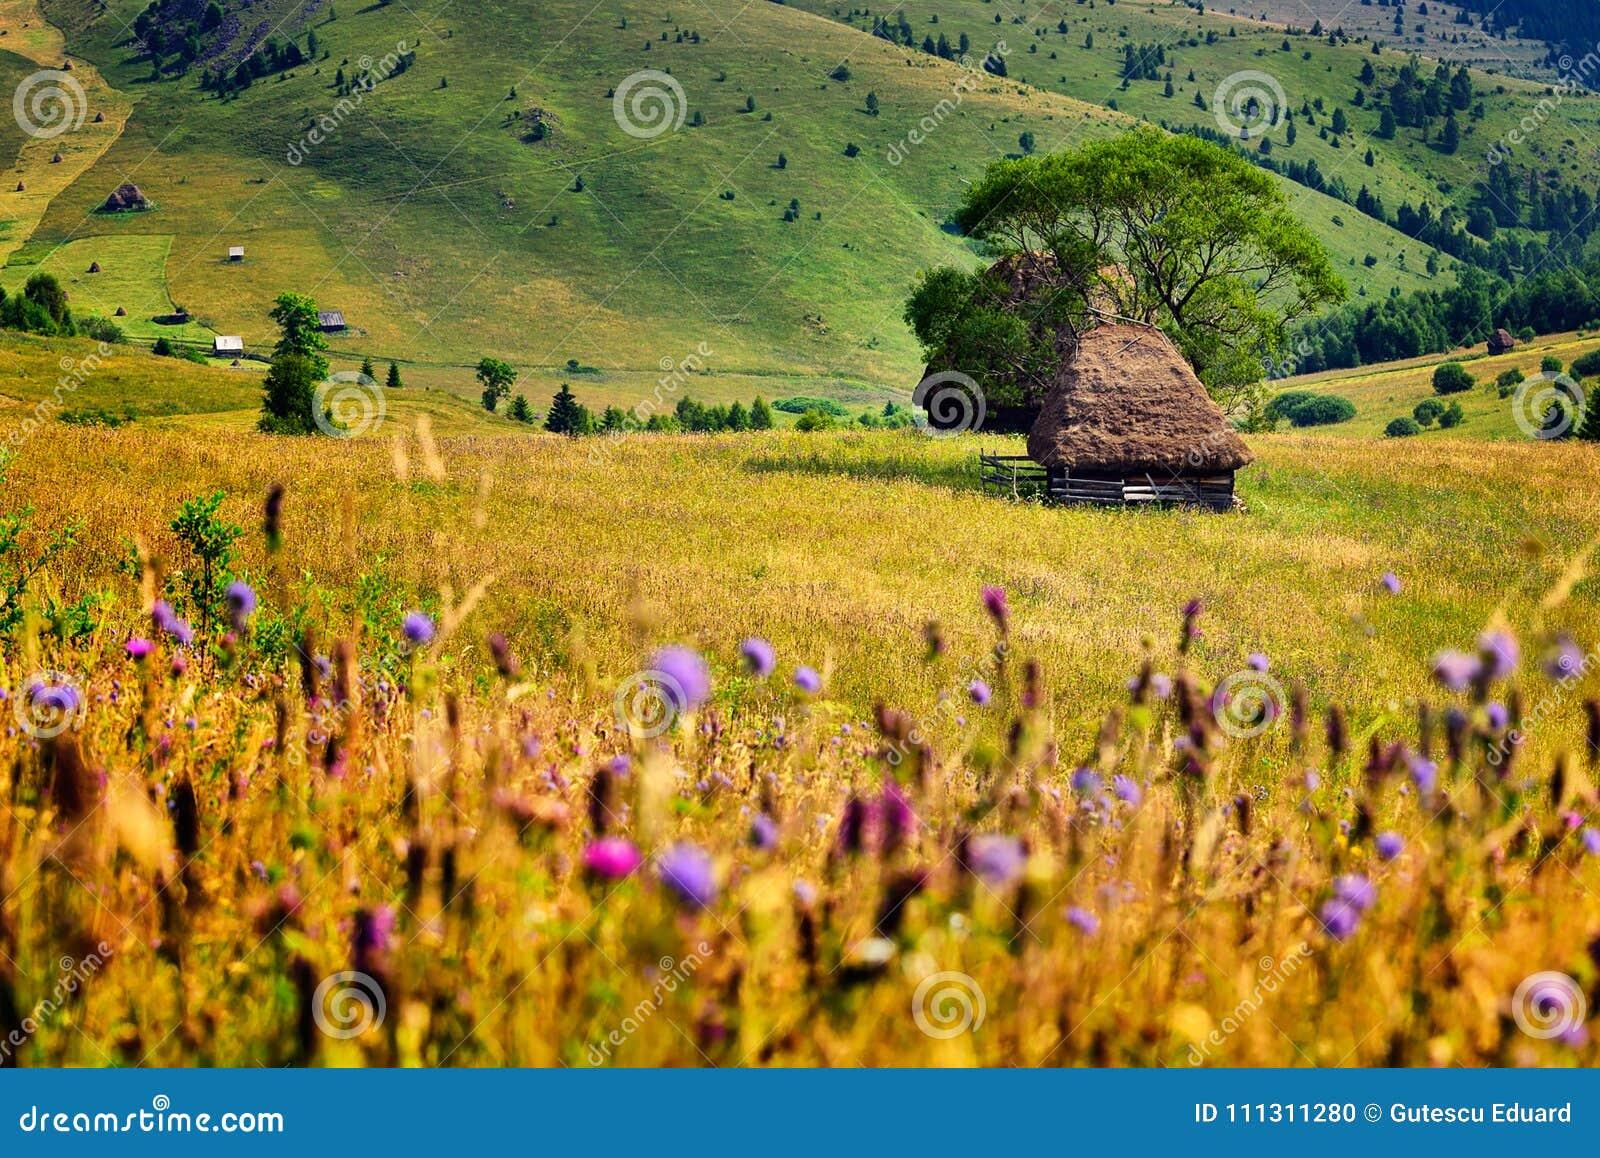 Roemenië, Apuseni-berg in de lente, traditionele huizen